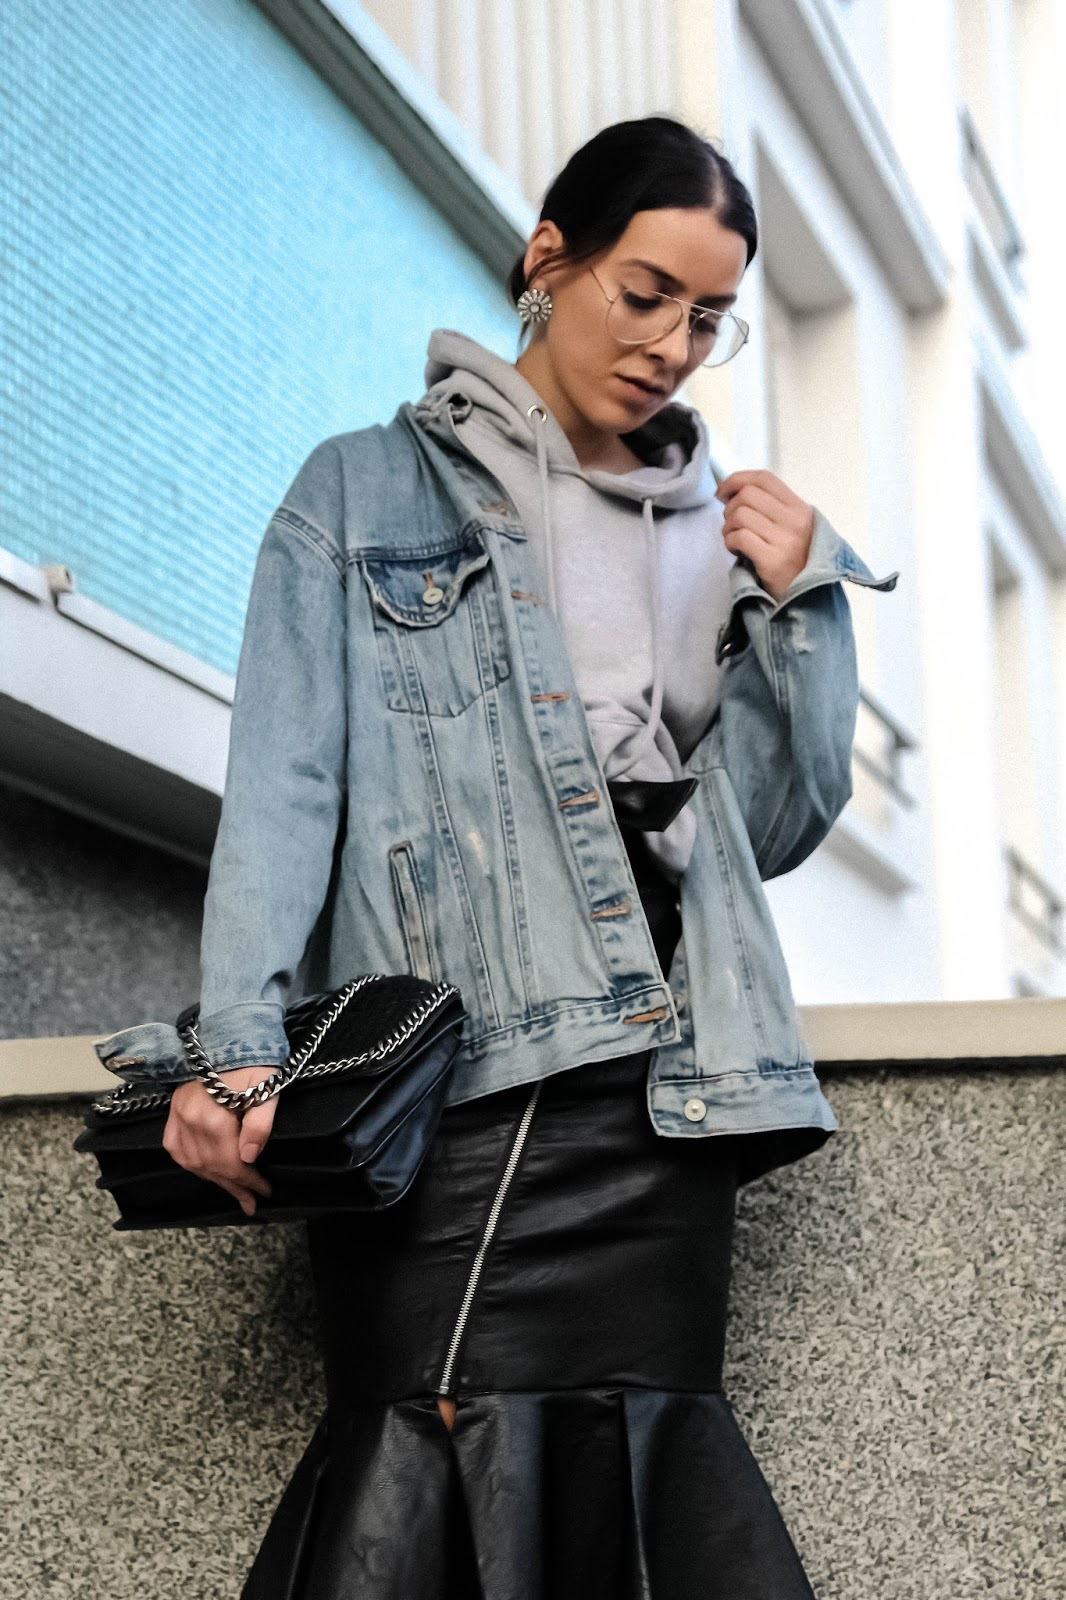 idée de look jupe en cuir et pull à capuche